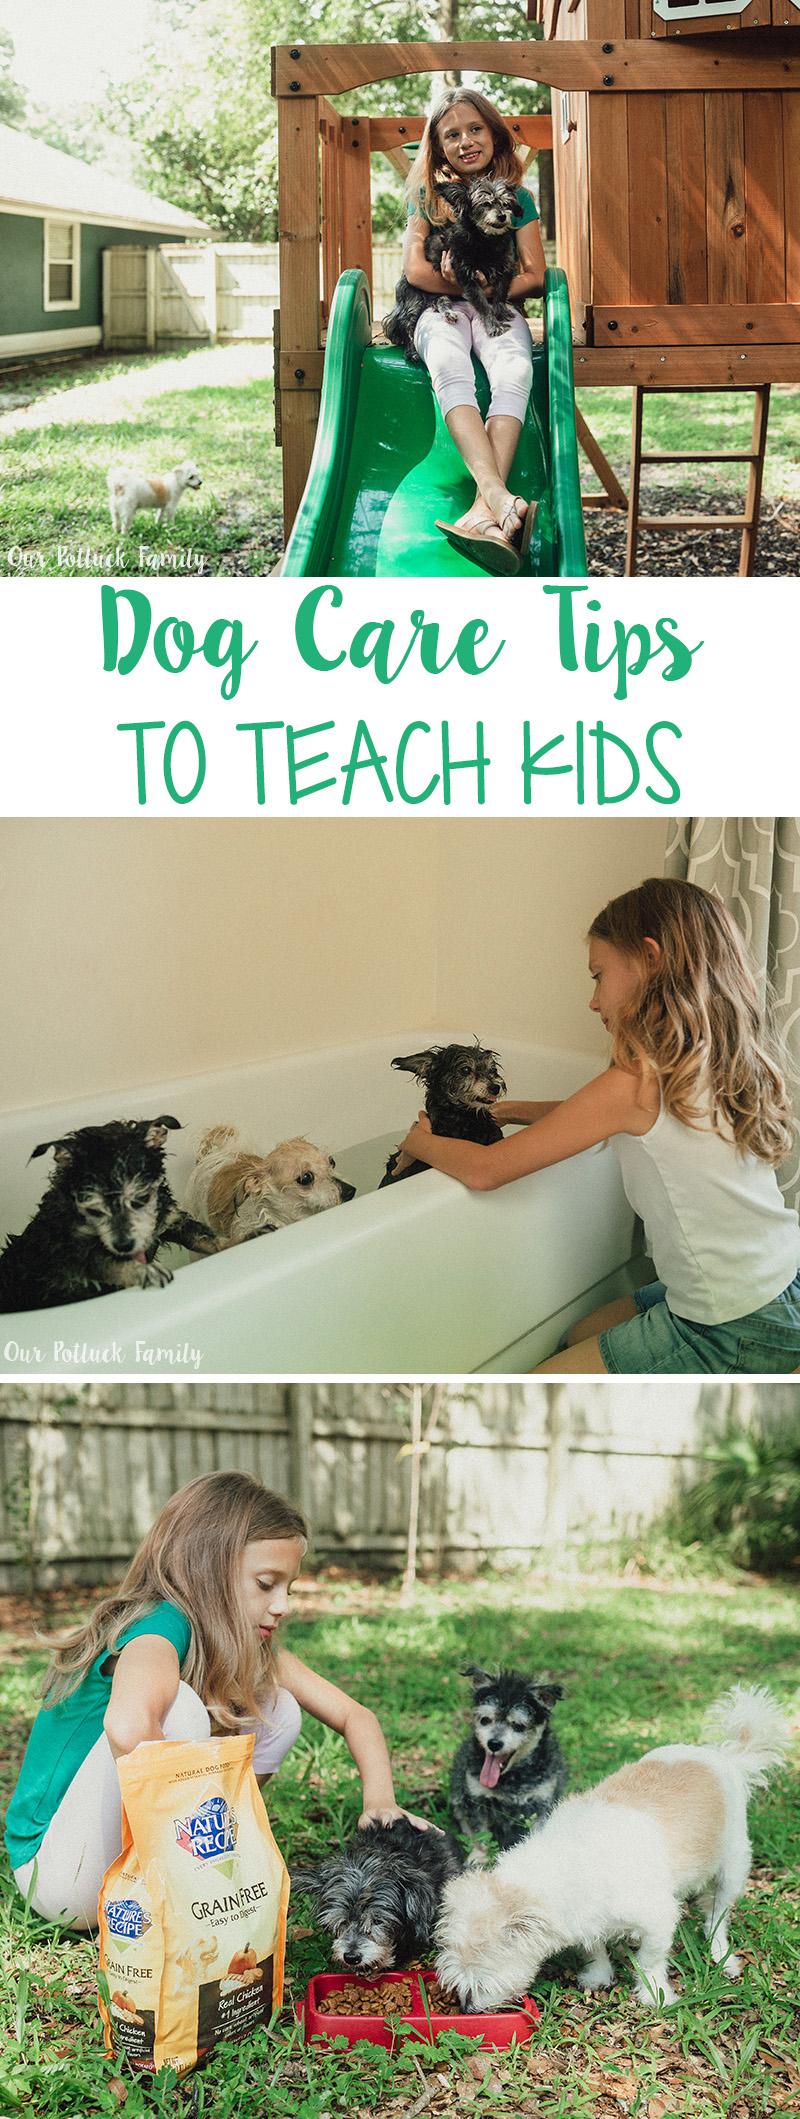 Dog Care Tips to Teach Kids